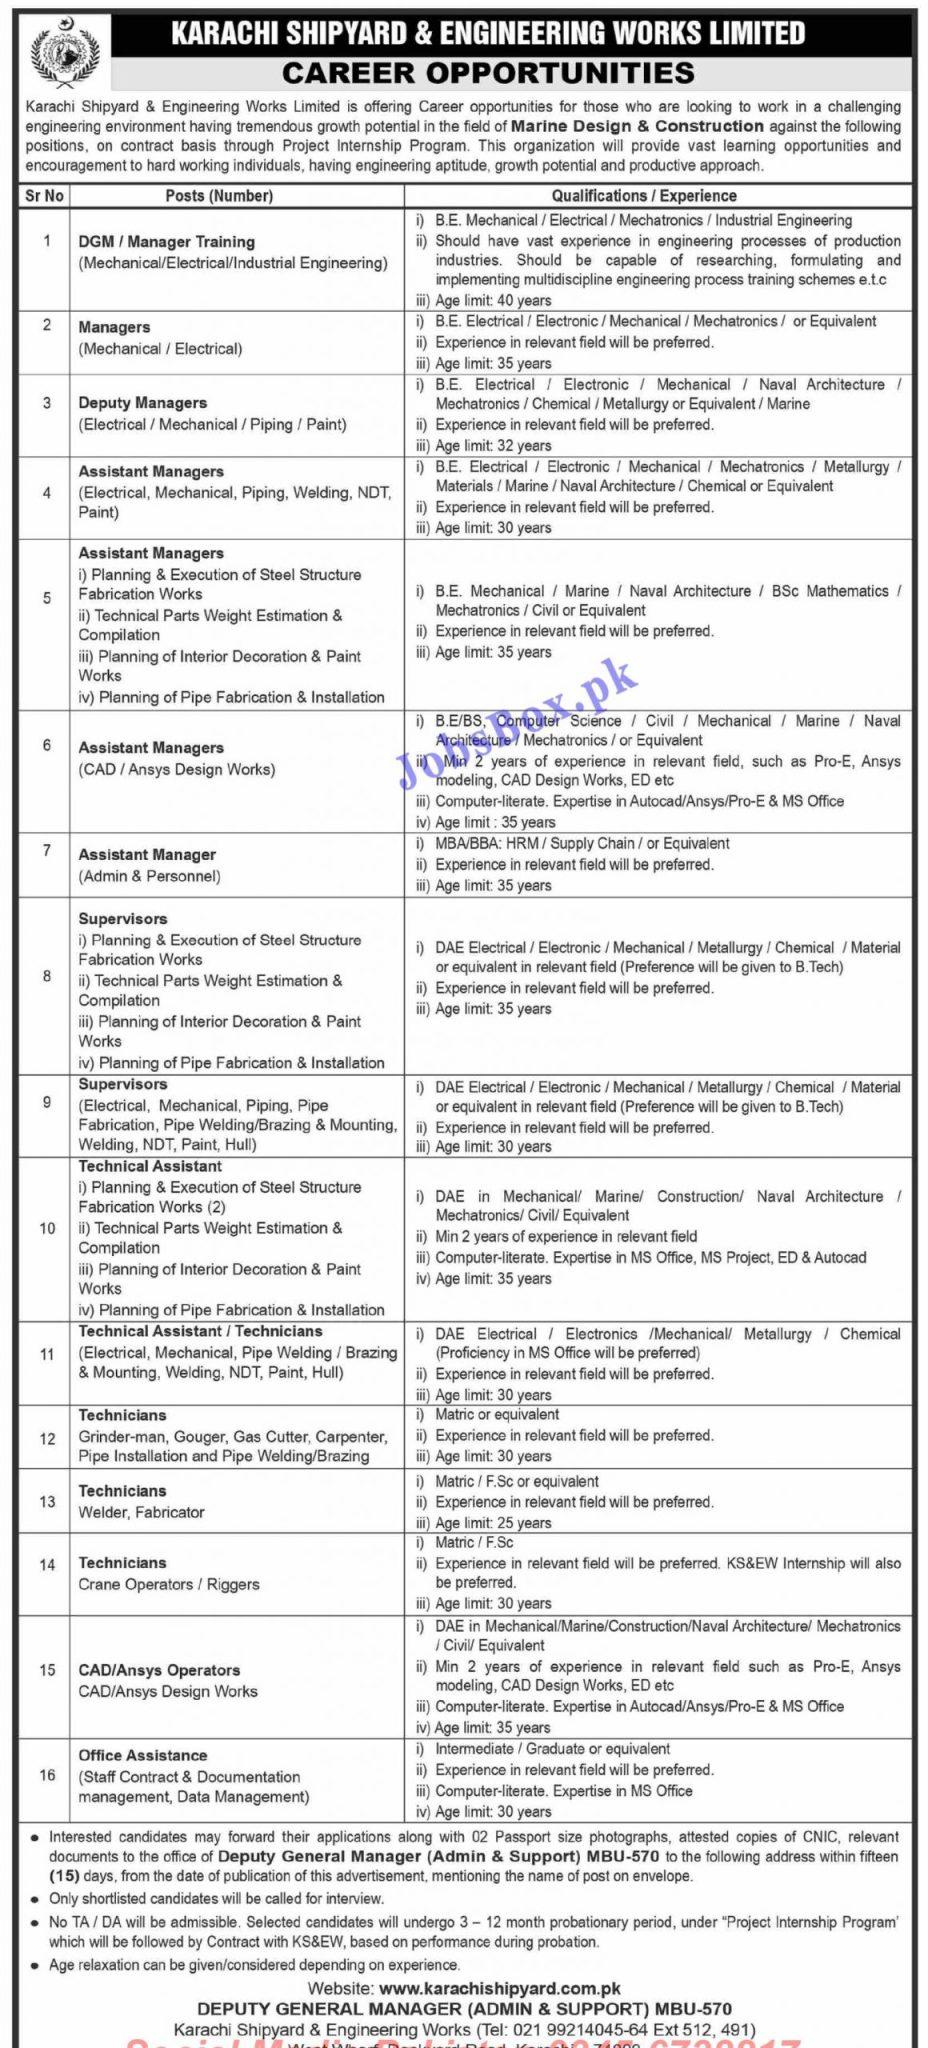 www.karachishipyard.com.pk Jobs 2021 - Karachi Shipyard and Engineering Works KSEW Jobs 2021 in Pakistan